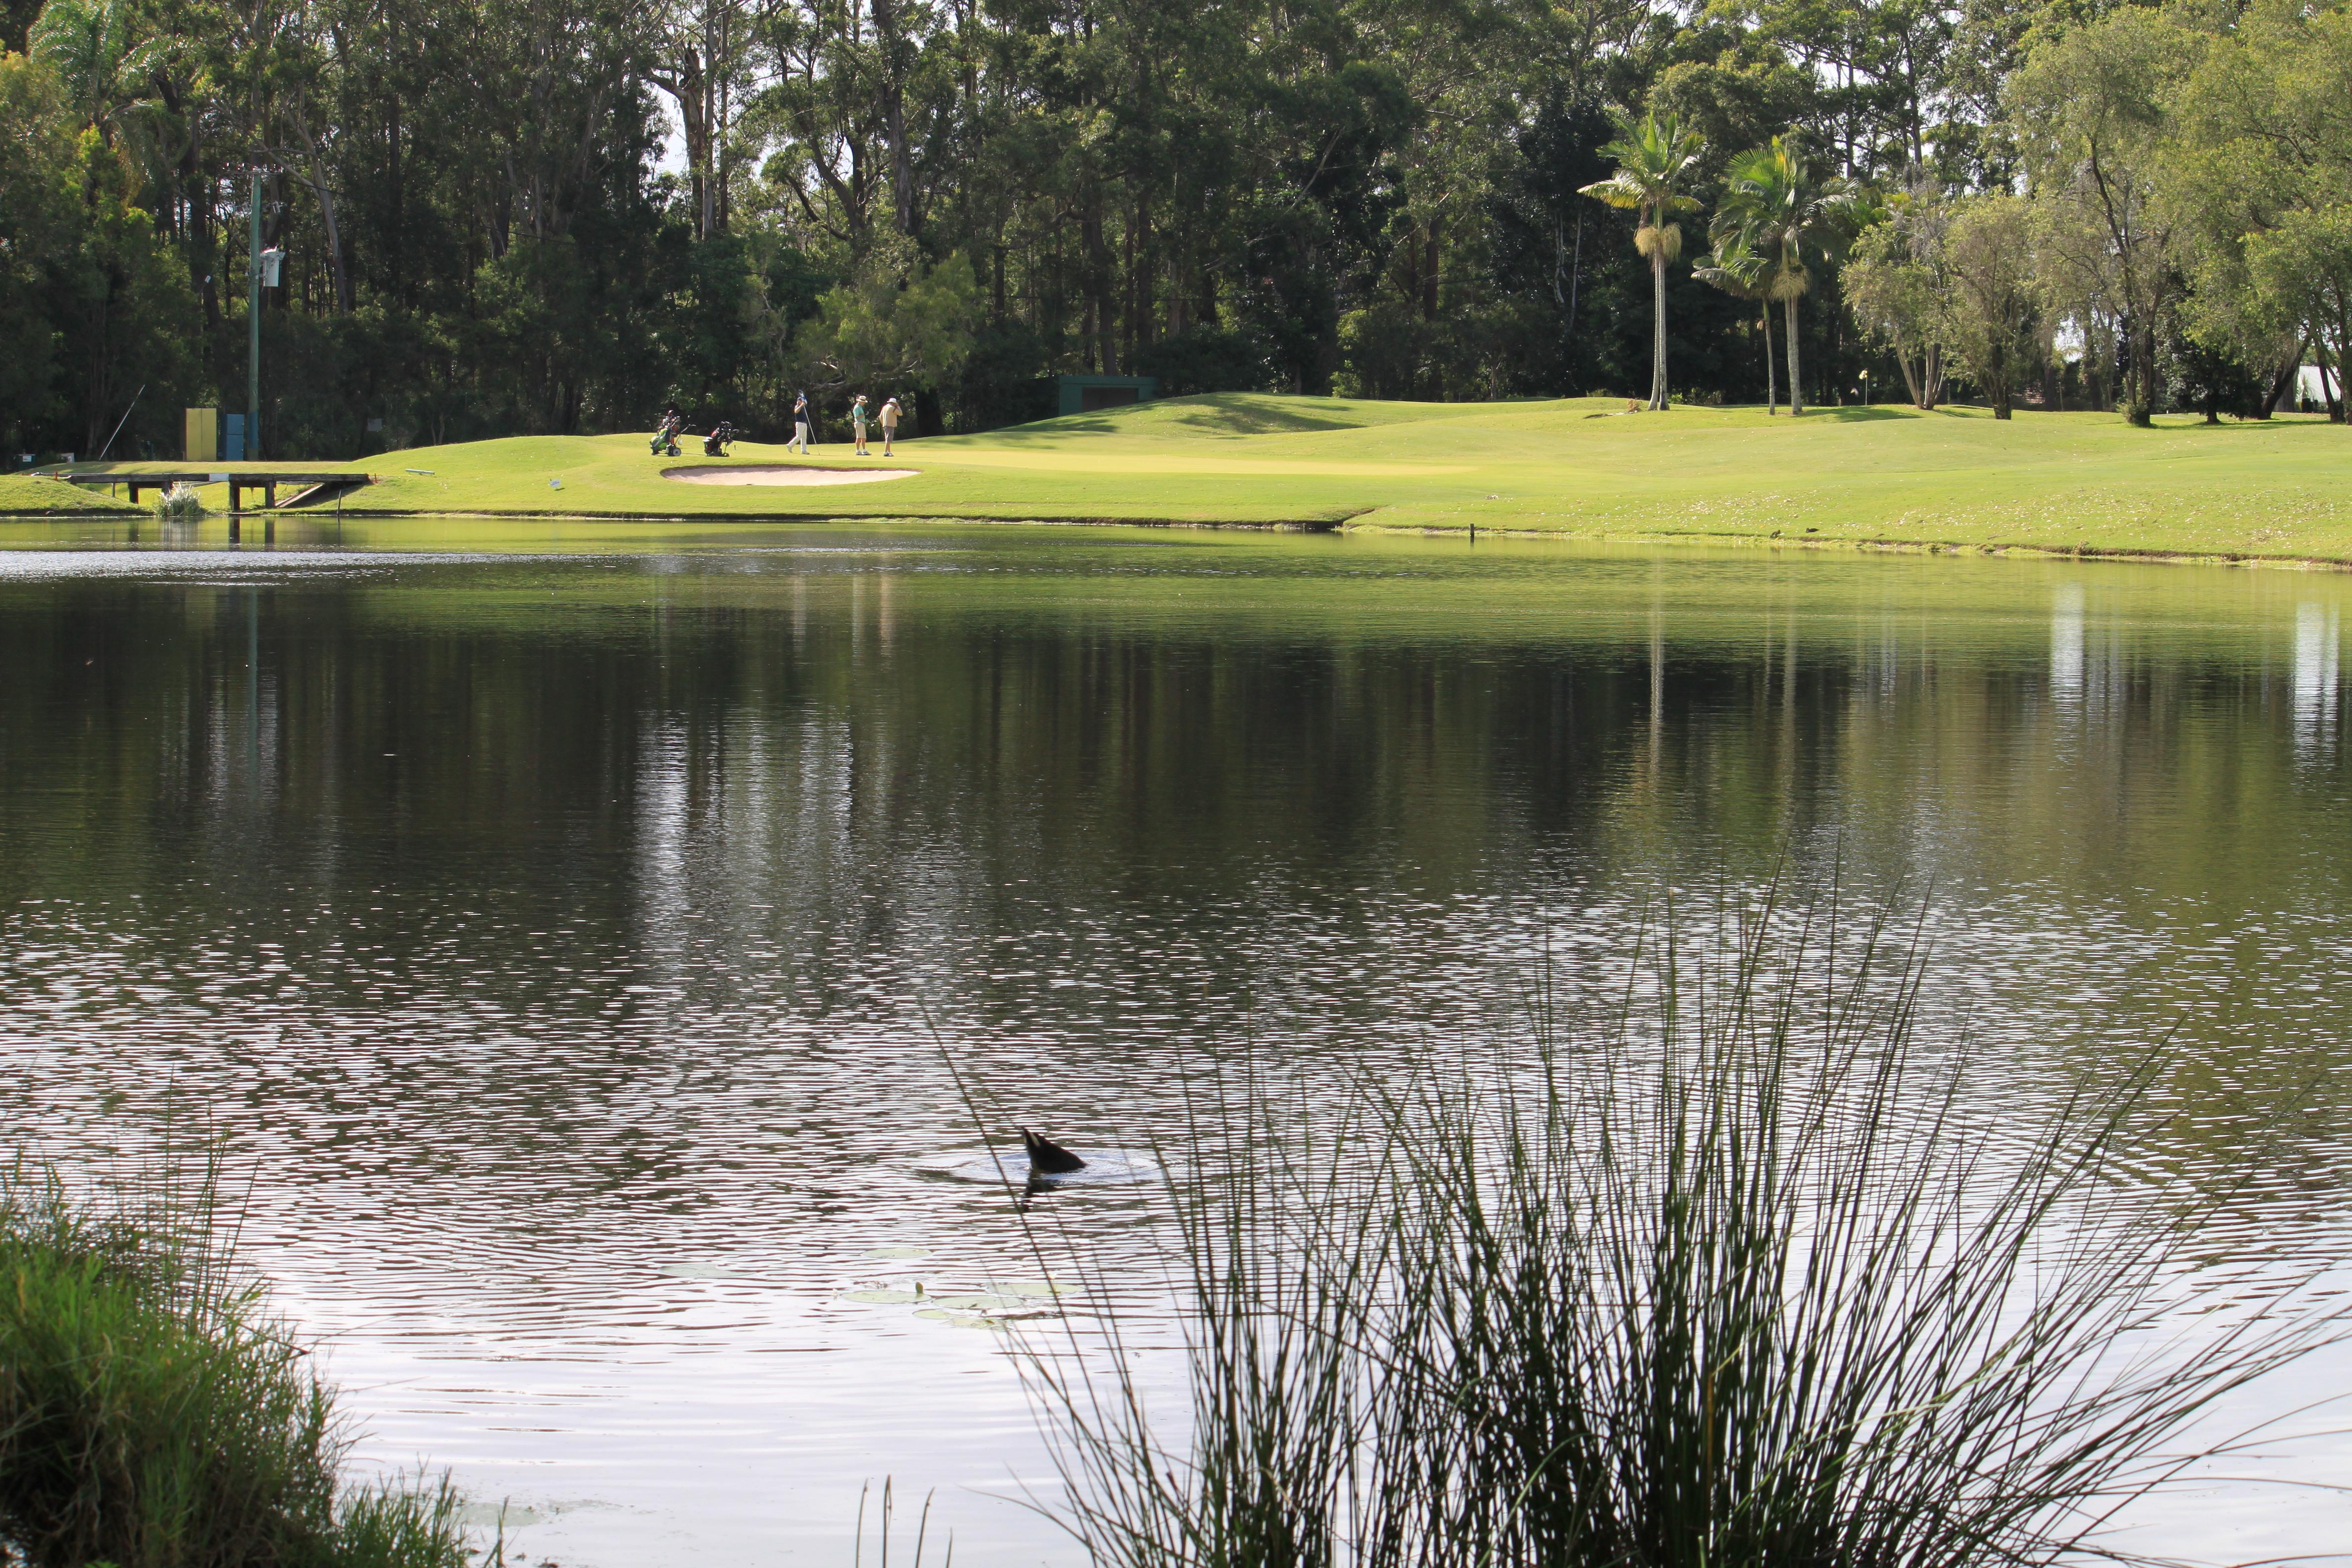 Headland golf